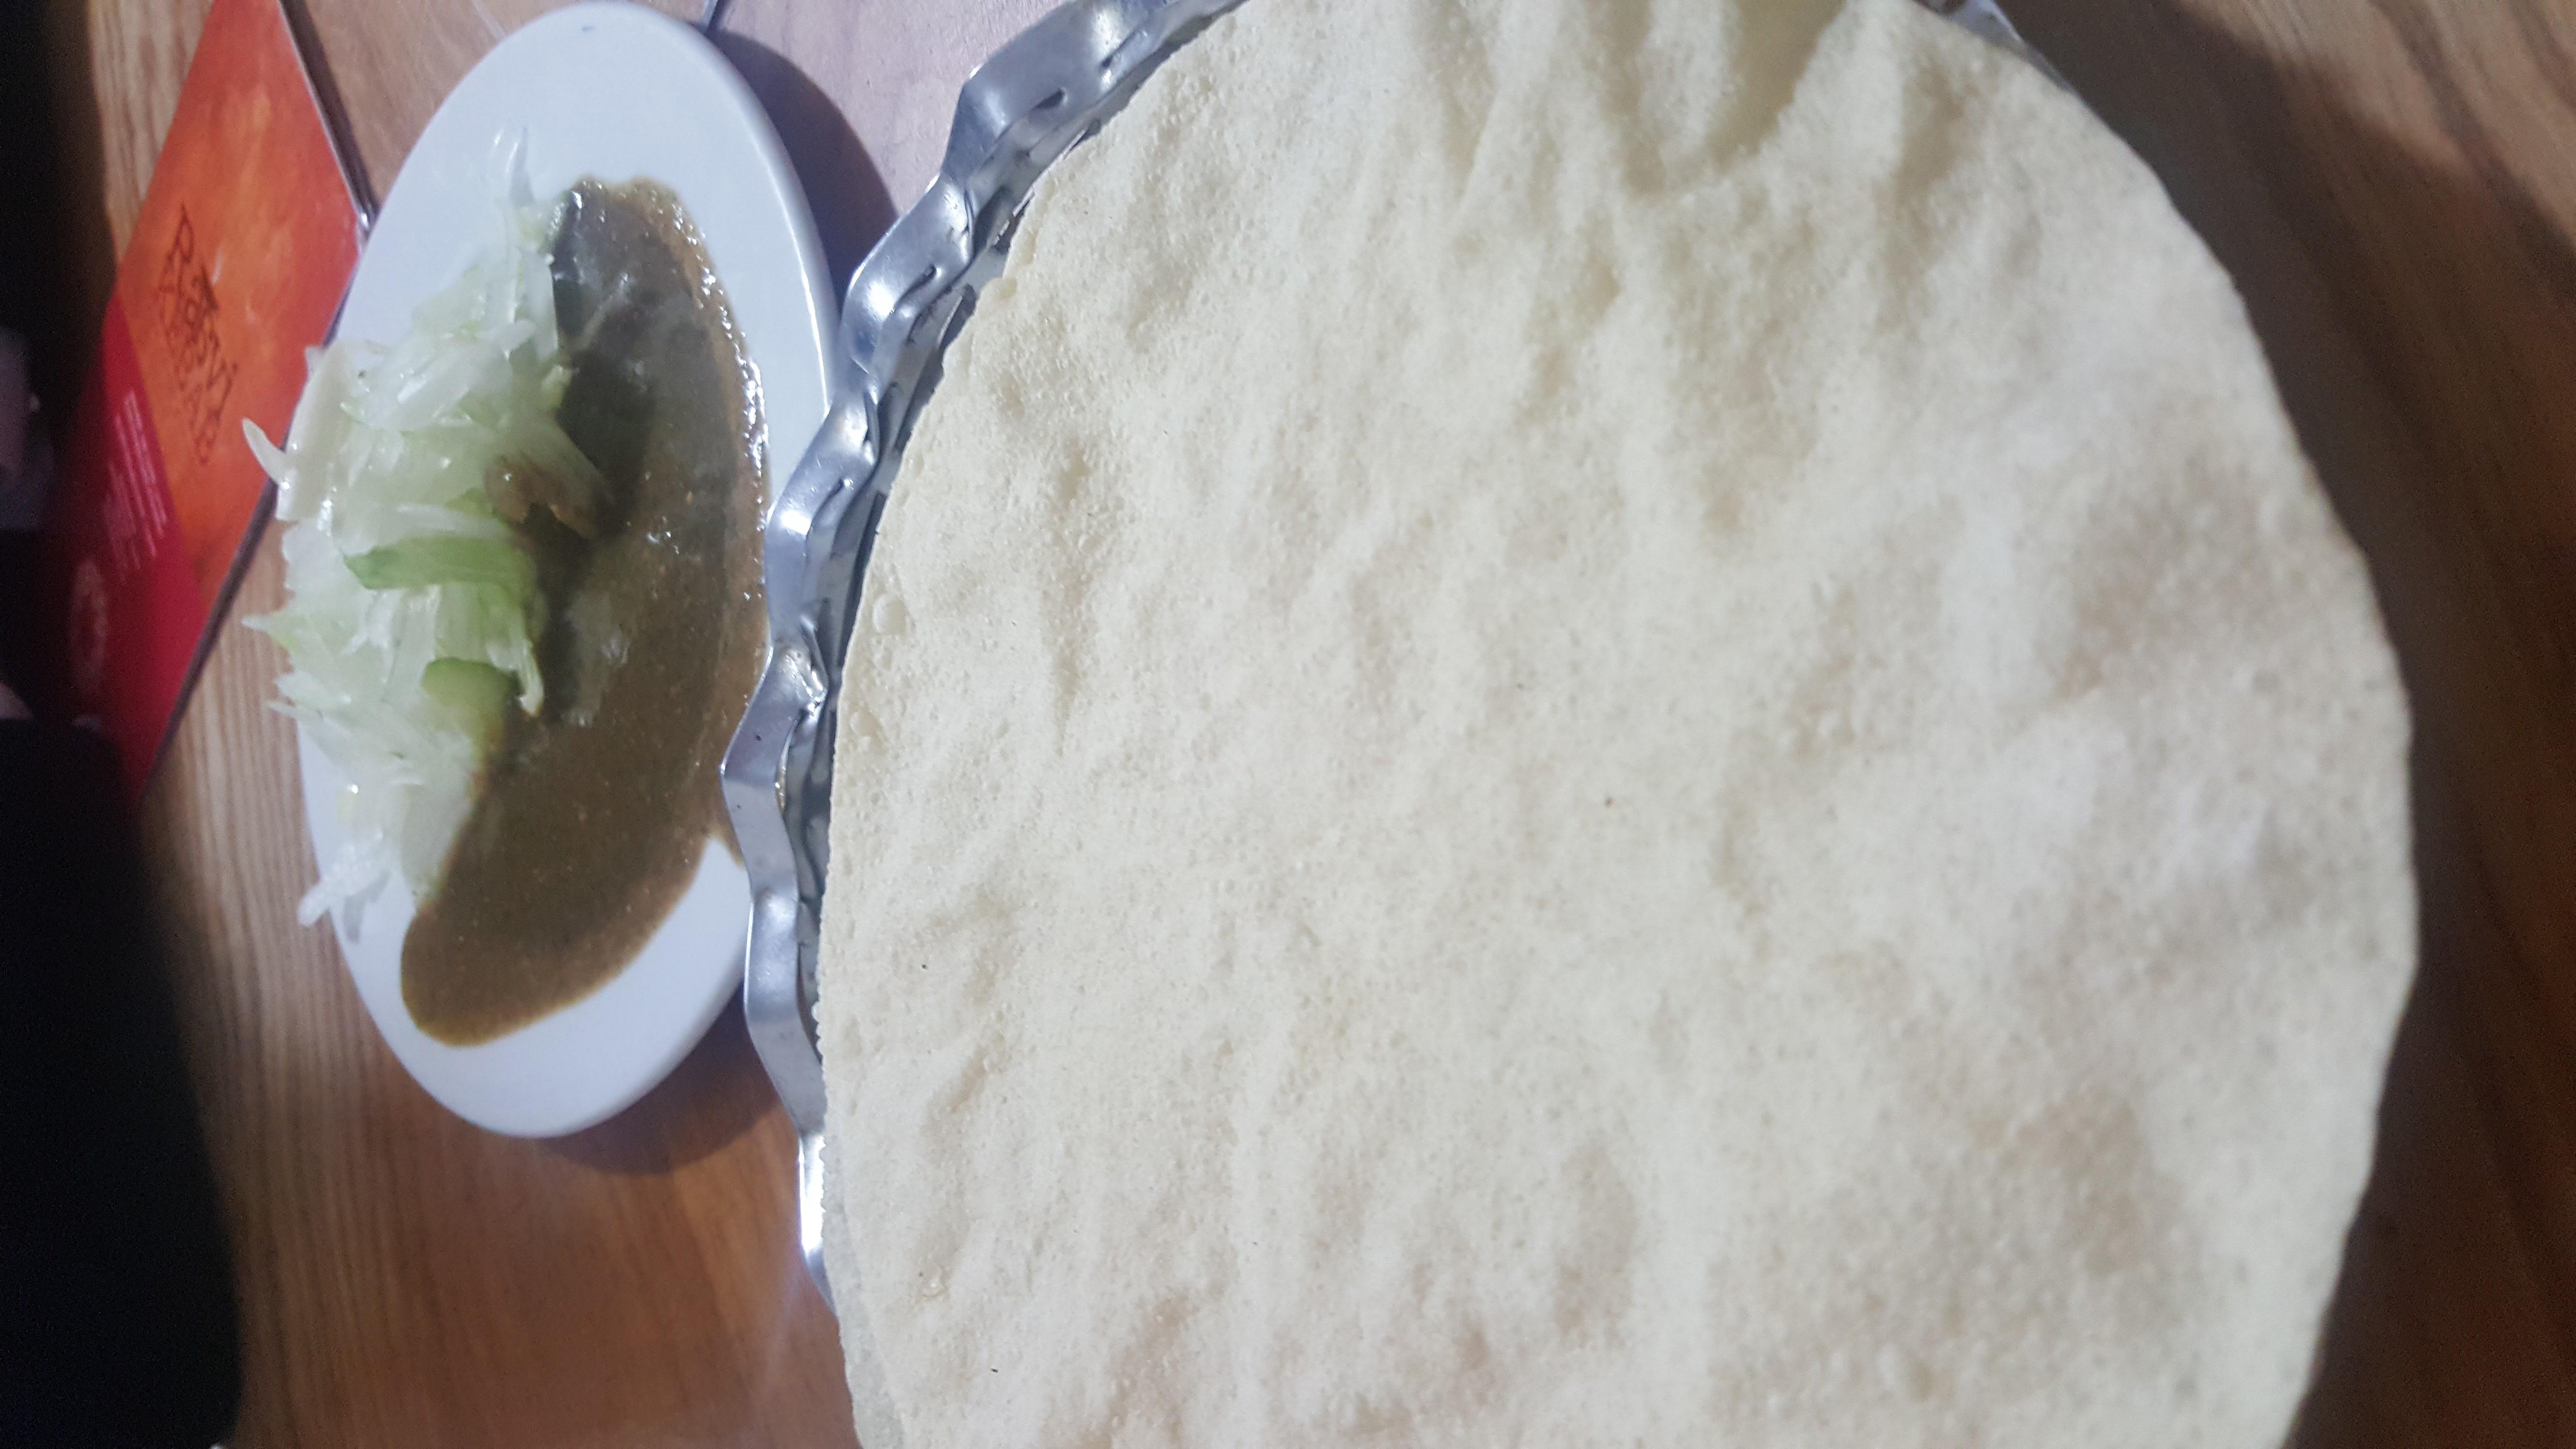 Poppadoms with green sauce